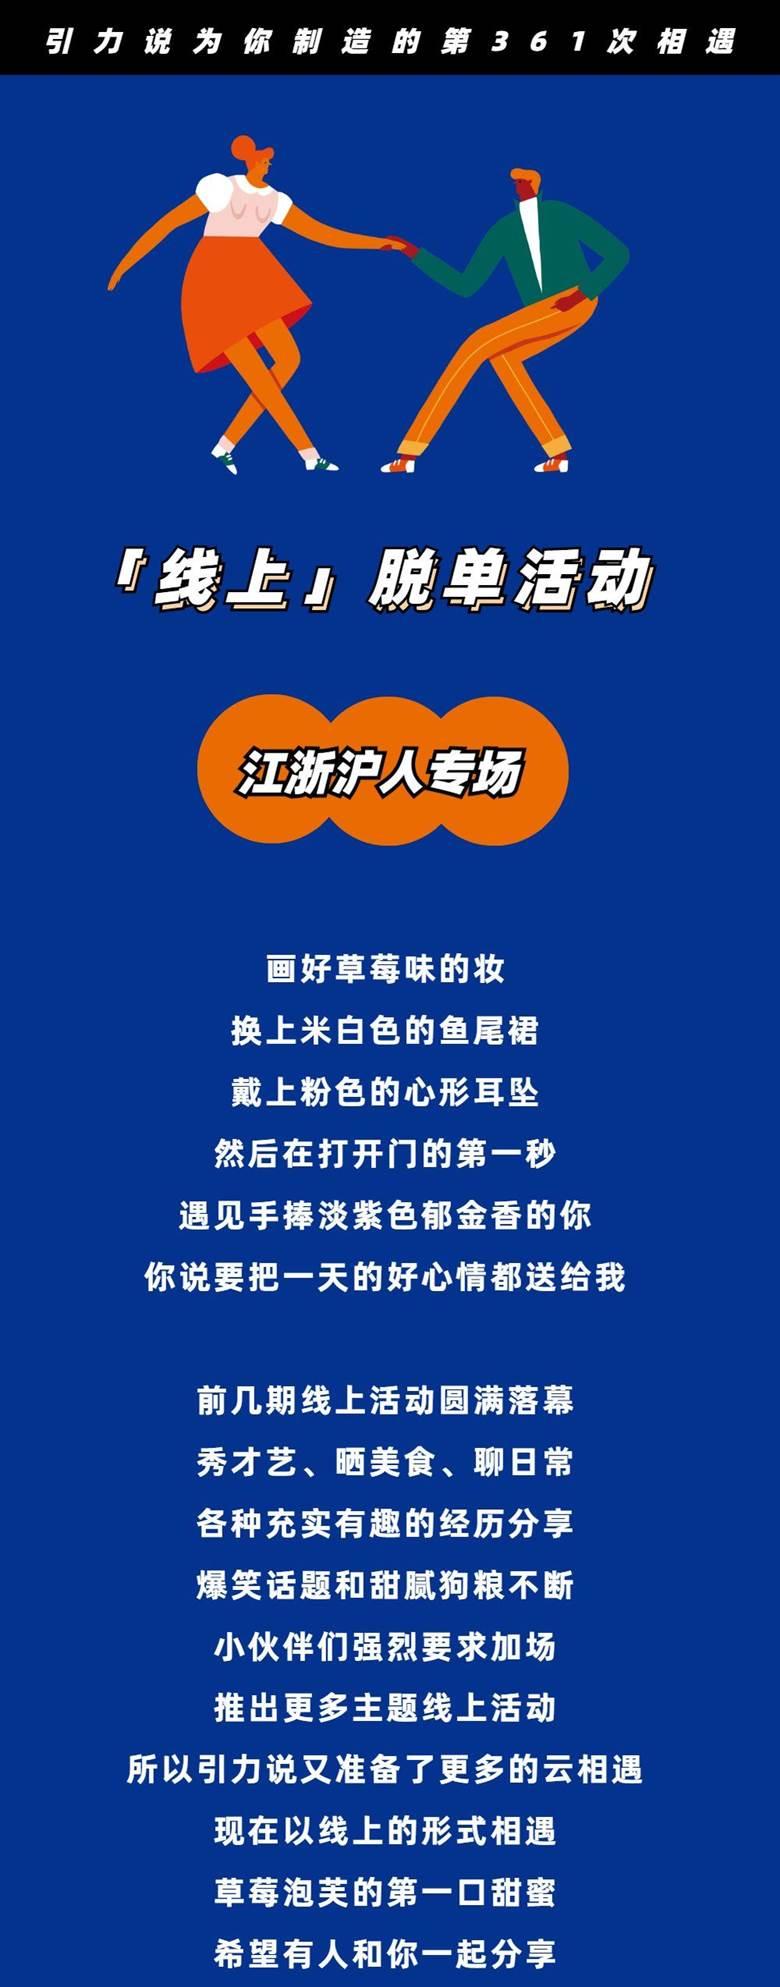 5.17苏州优质青年专场-1.png